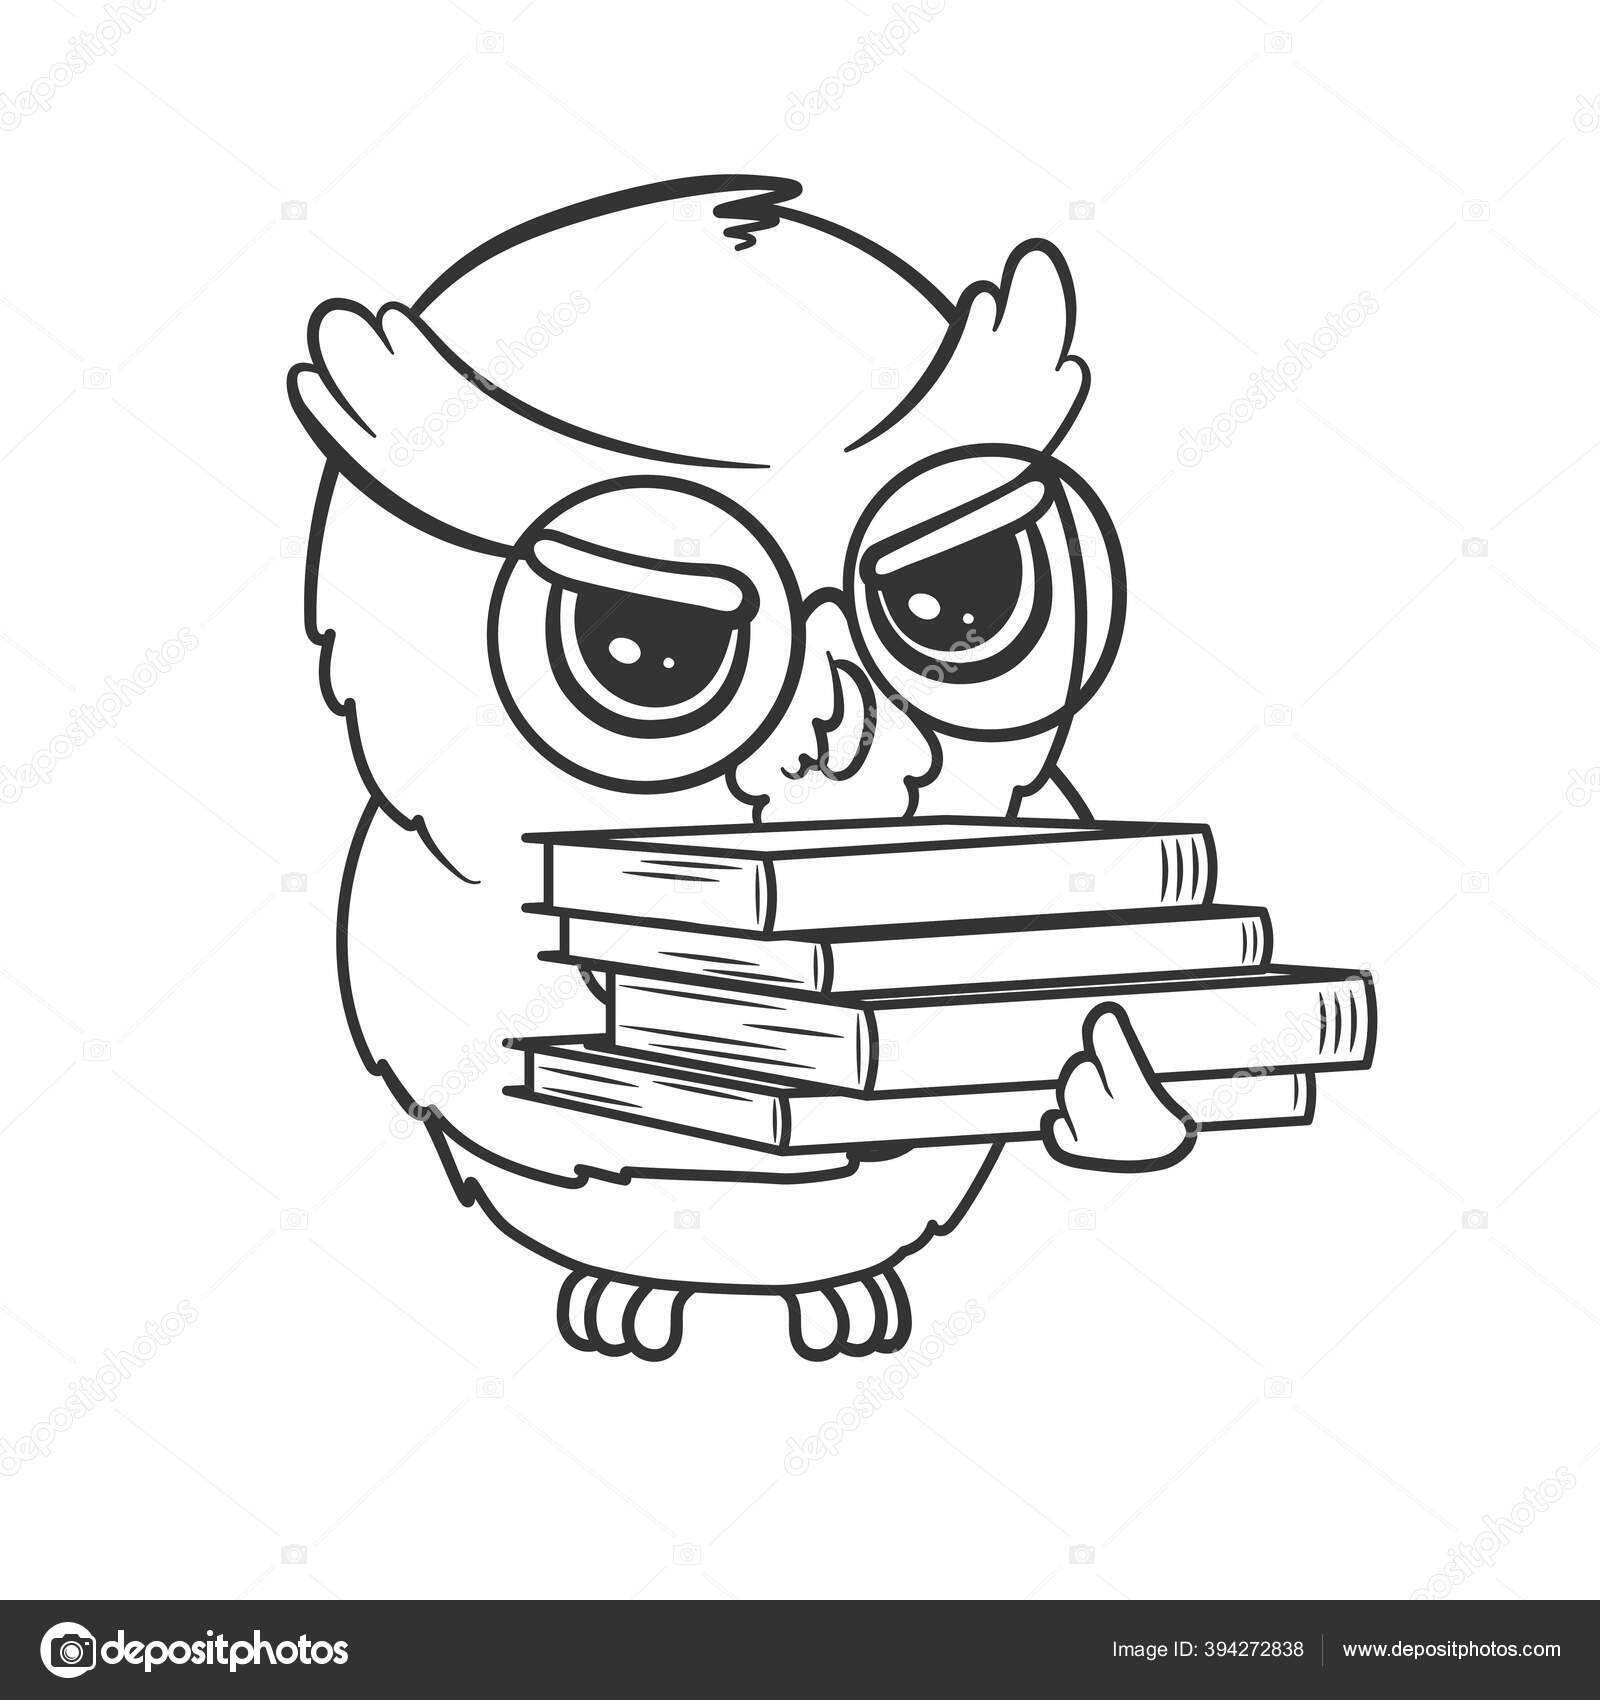 Burung Hantu Kartun Yang Lucu Dengan Setumpuk Buku Yang Terisolasi Stok Vektor C Exit Near Gmail Com 394272838